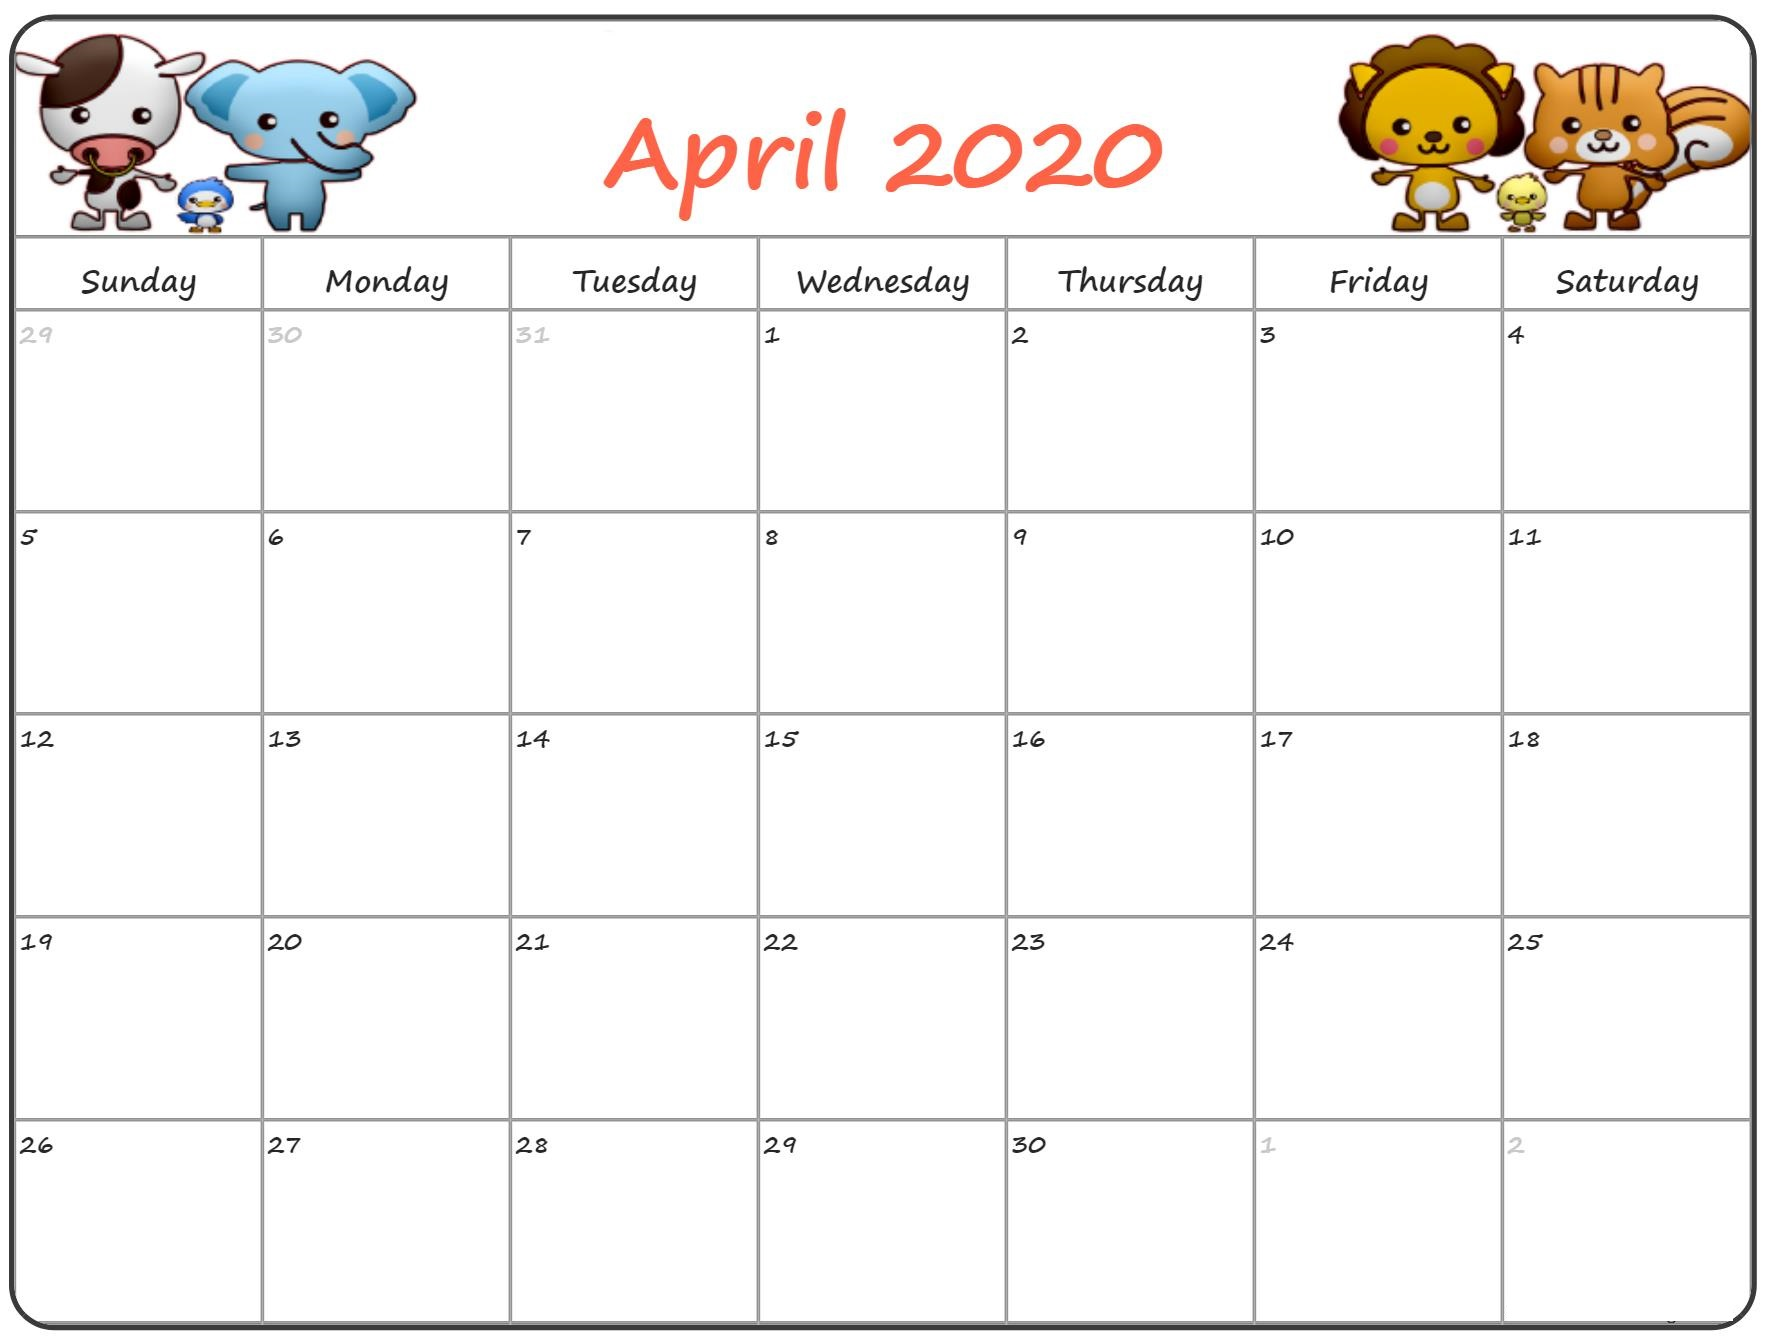 Cute April 2020 Calendar Floral